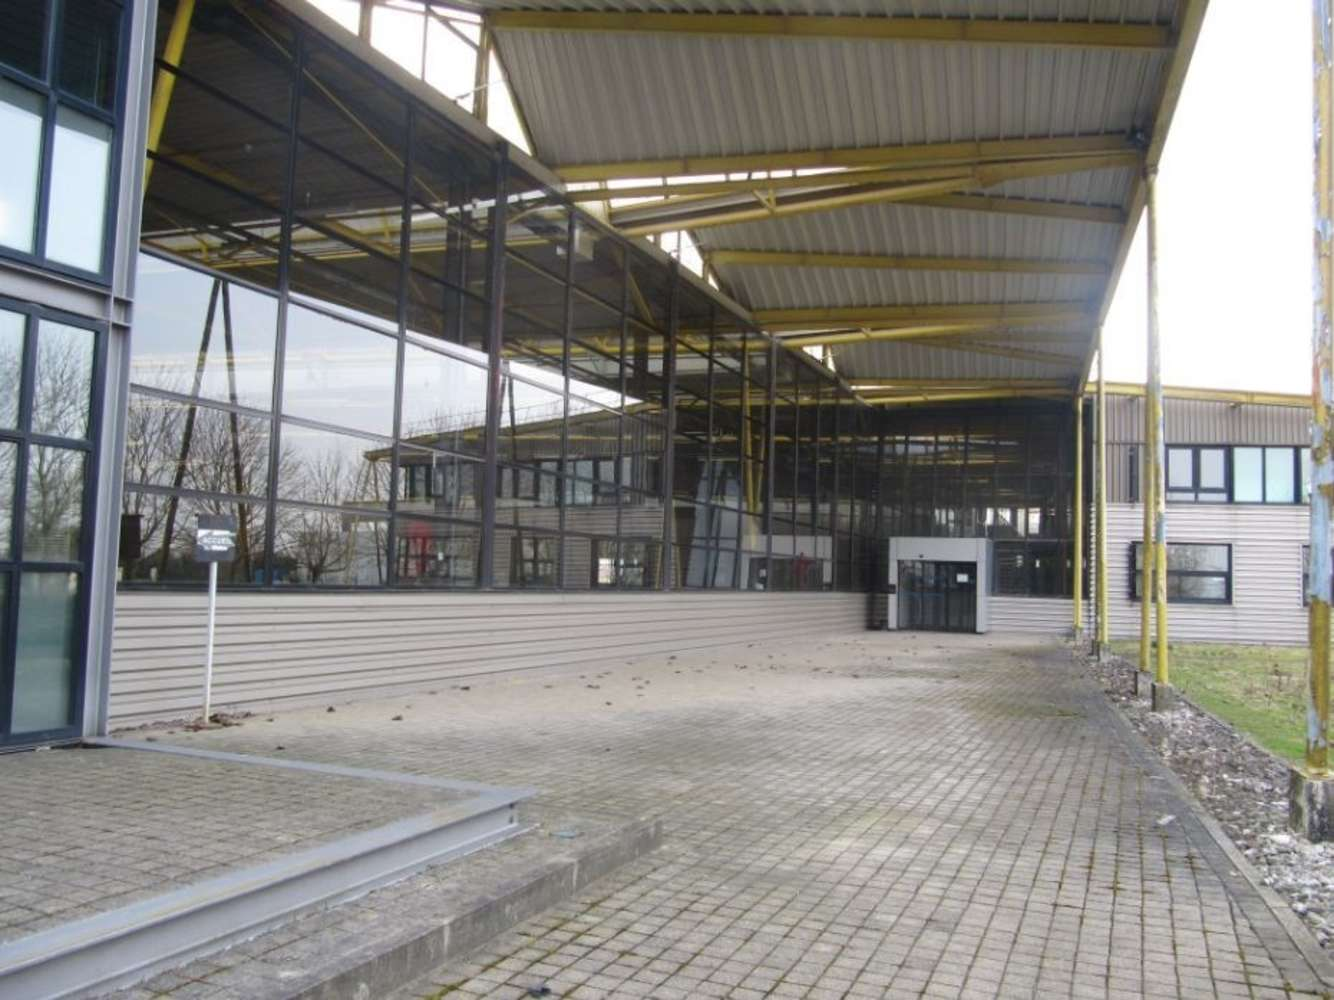 Activités/entrepôt Roissy en france, 95700 - 4 RUE DE LA PRESSE - 9449801